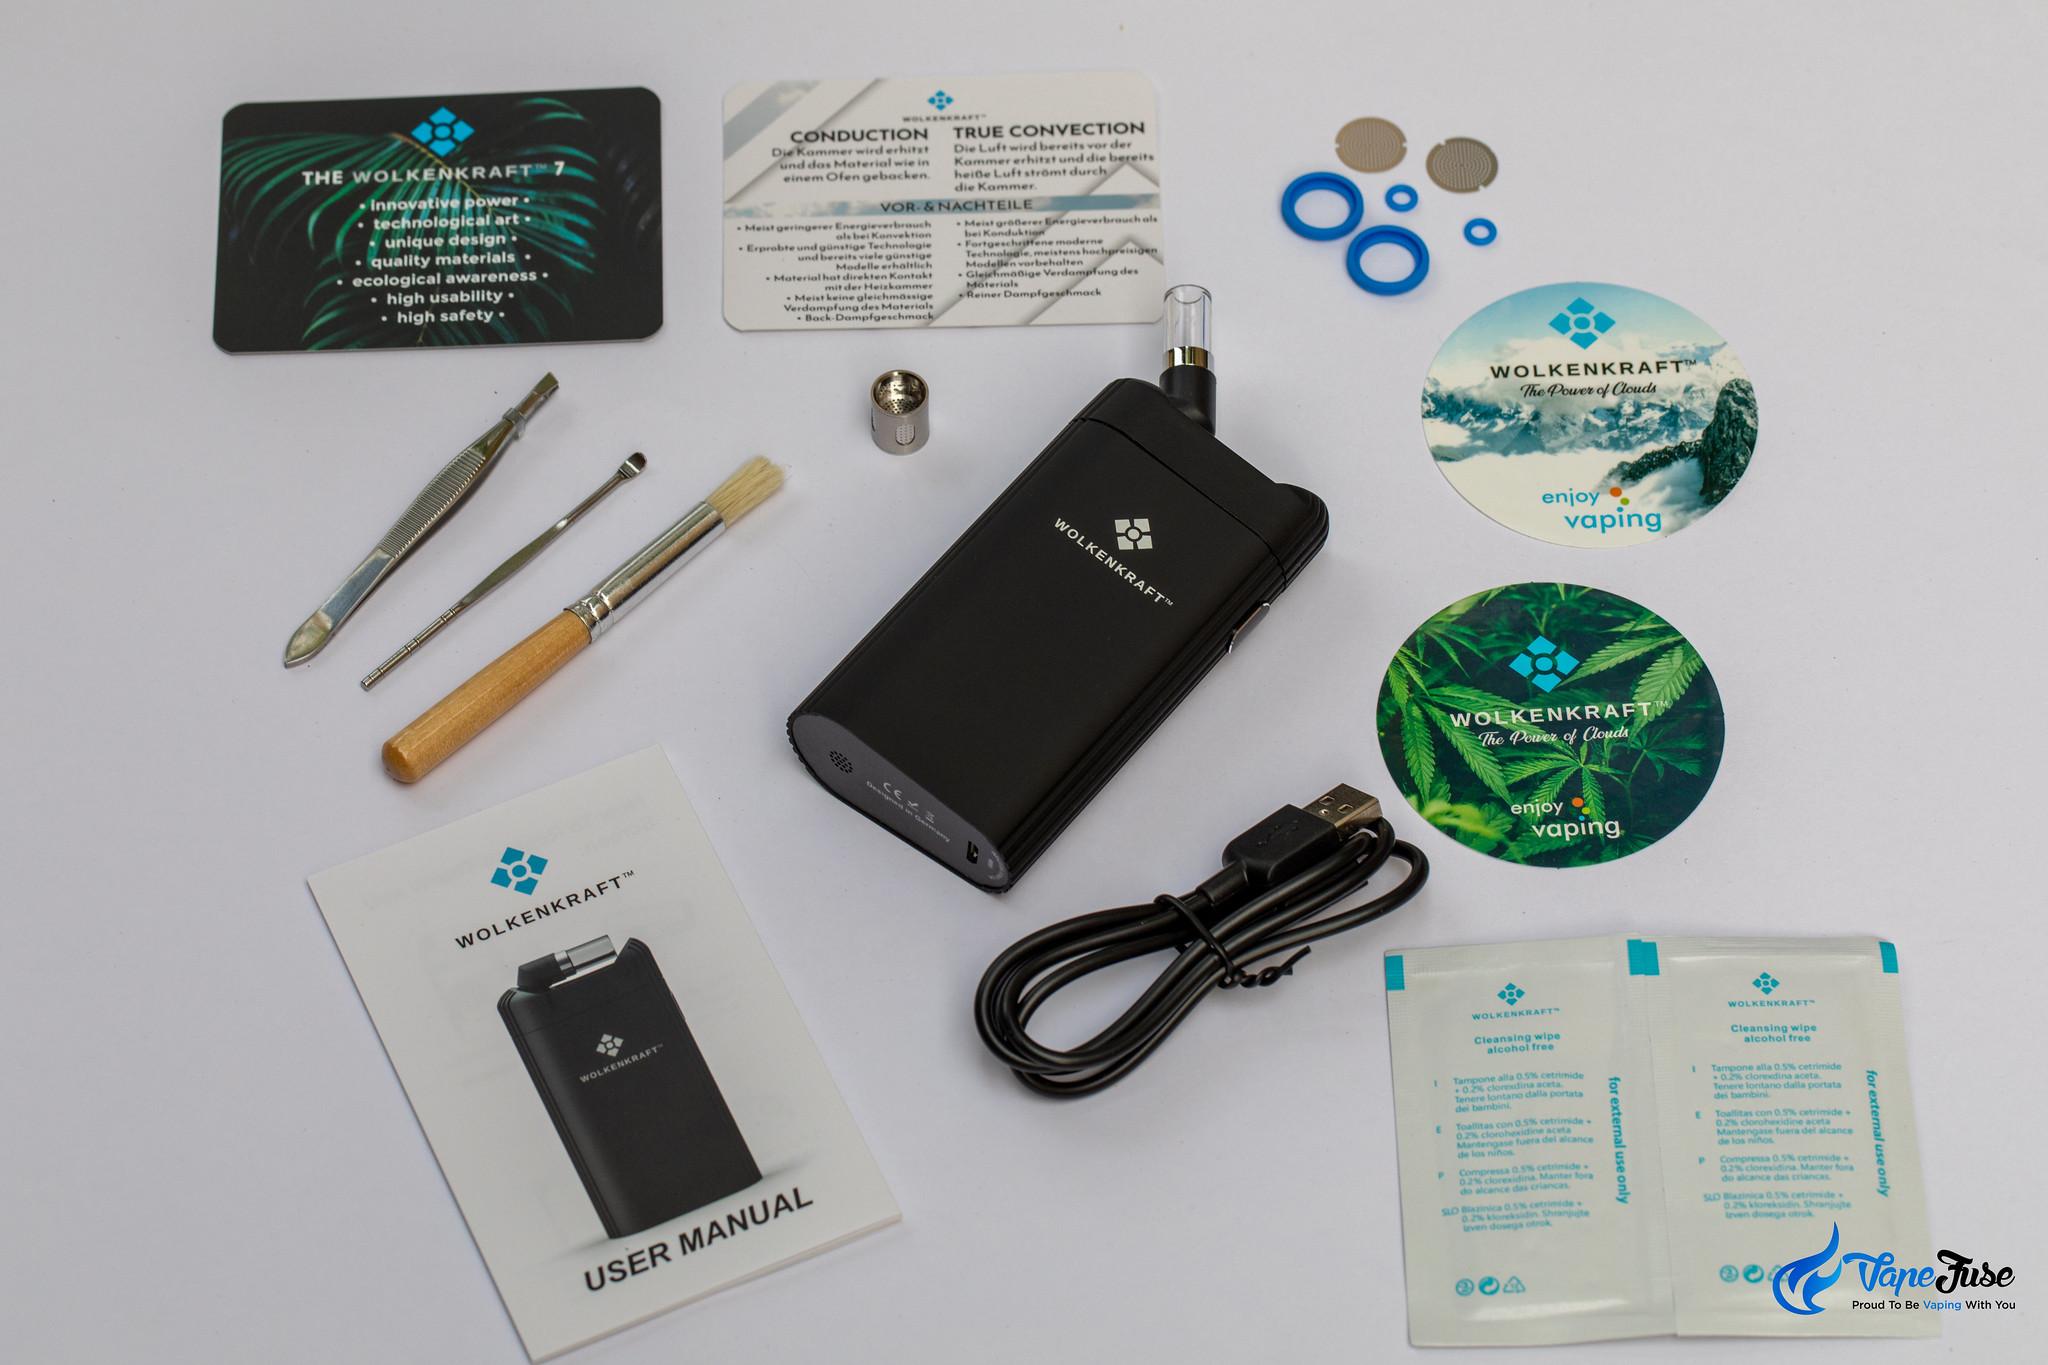 Wolkenkraft FX+ Vaporizer Kit